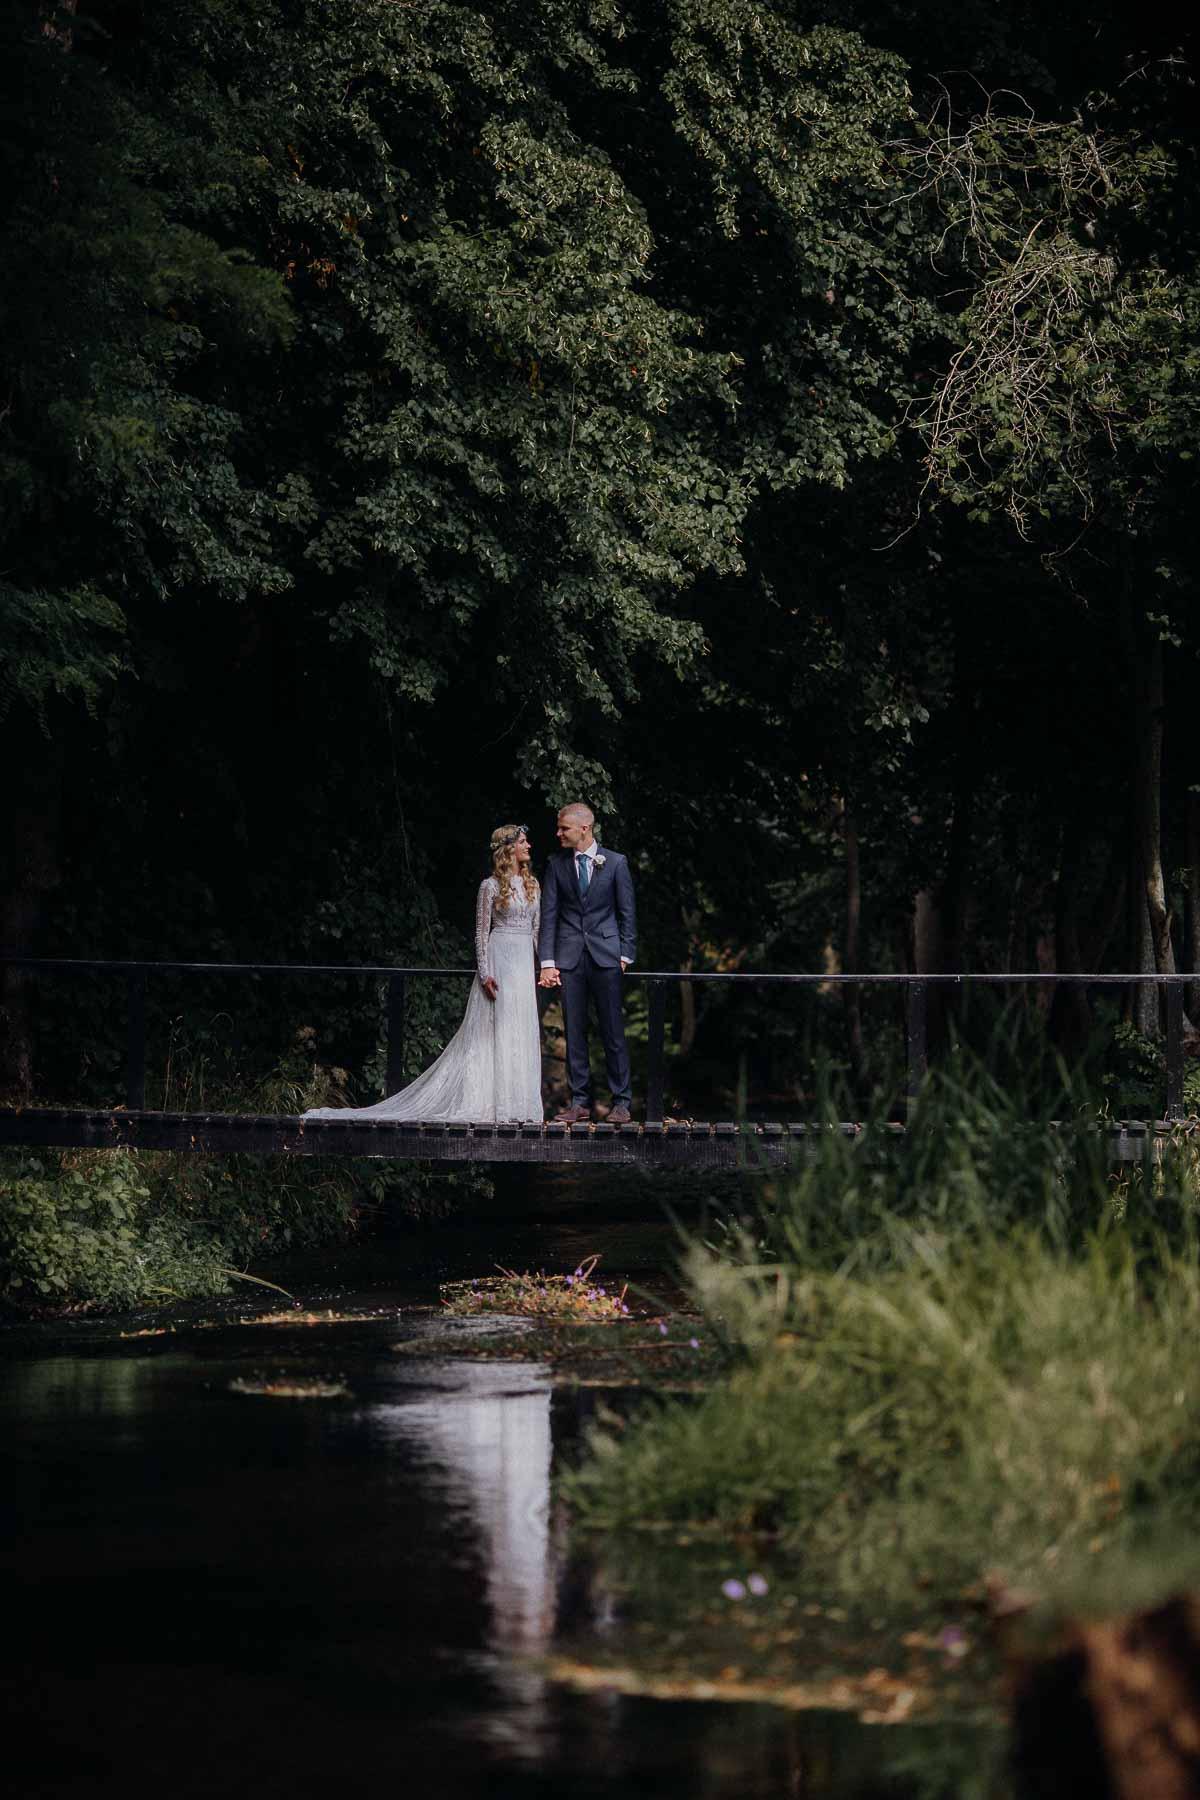 Hvad koster en gratis bryllupsfotografering?